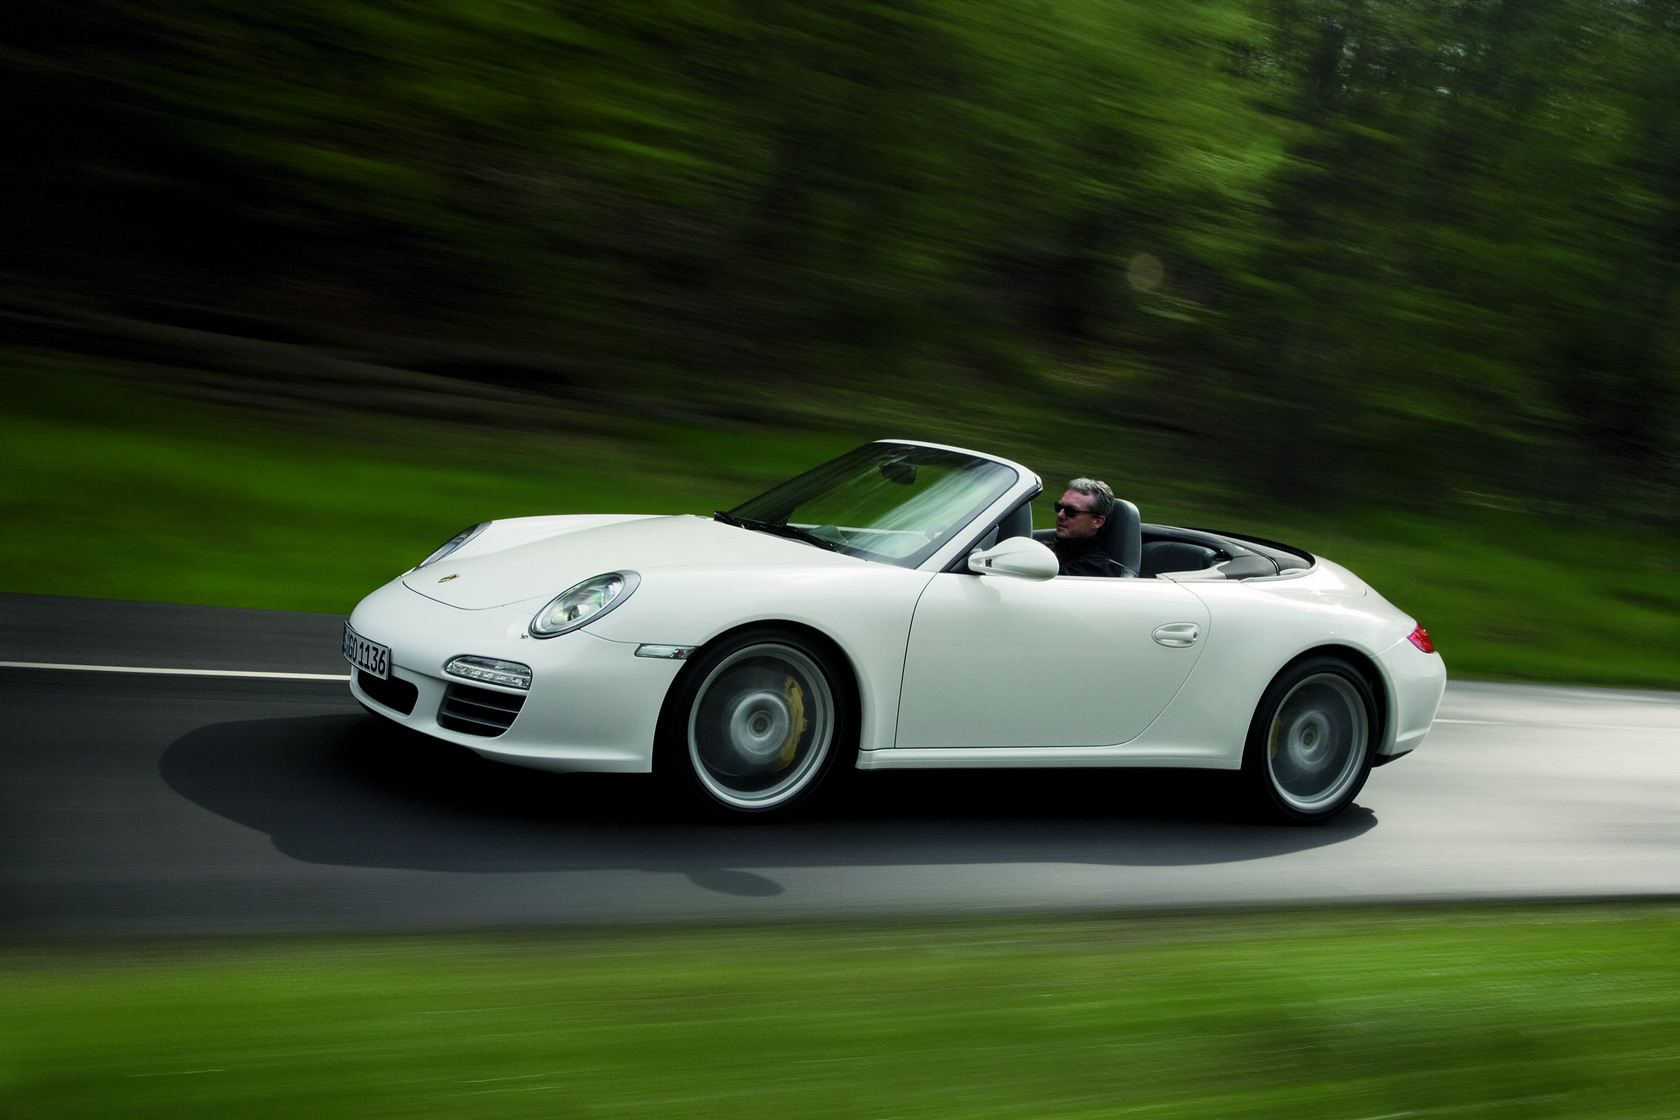 porsche 911 carrera 4s cabrio auto wallpapers. Black Bedroom Furniture Sets. Home Design Ideas